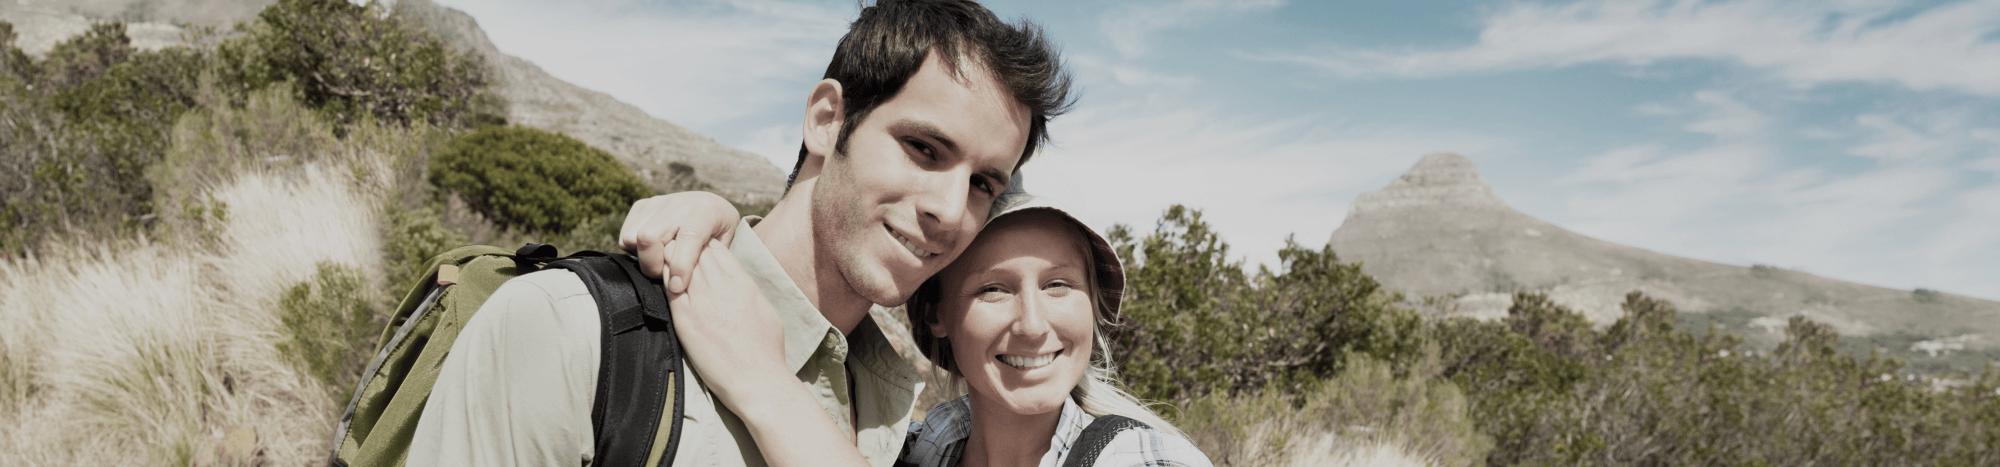 hd-heisengard-couples-trekking-2